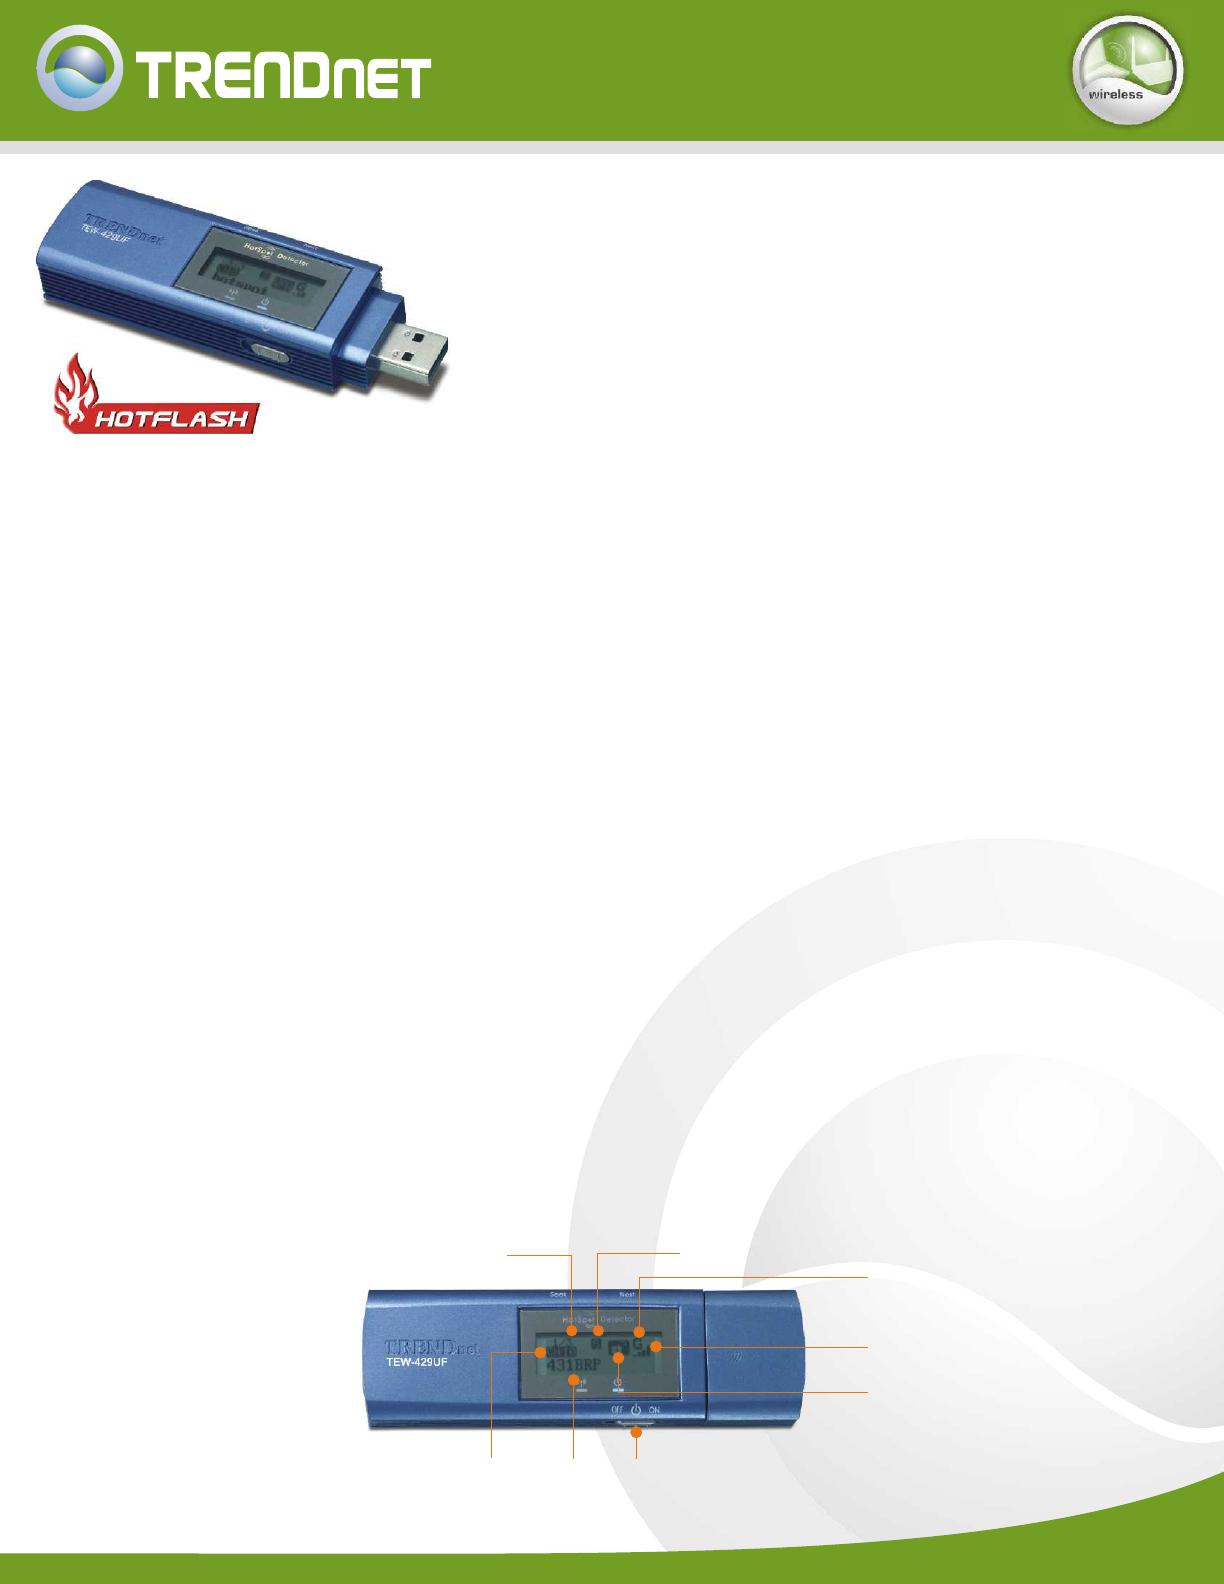 TRENDNET TEW-429UF WIRELESS NETWORK ADAPTER WINDOWS 8 X64 DRIVER DOWNLOAD